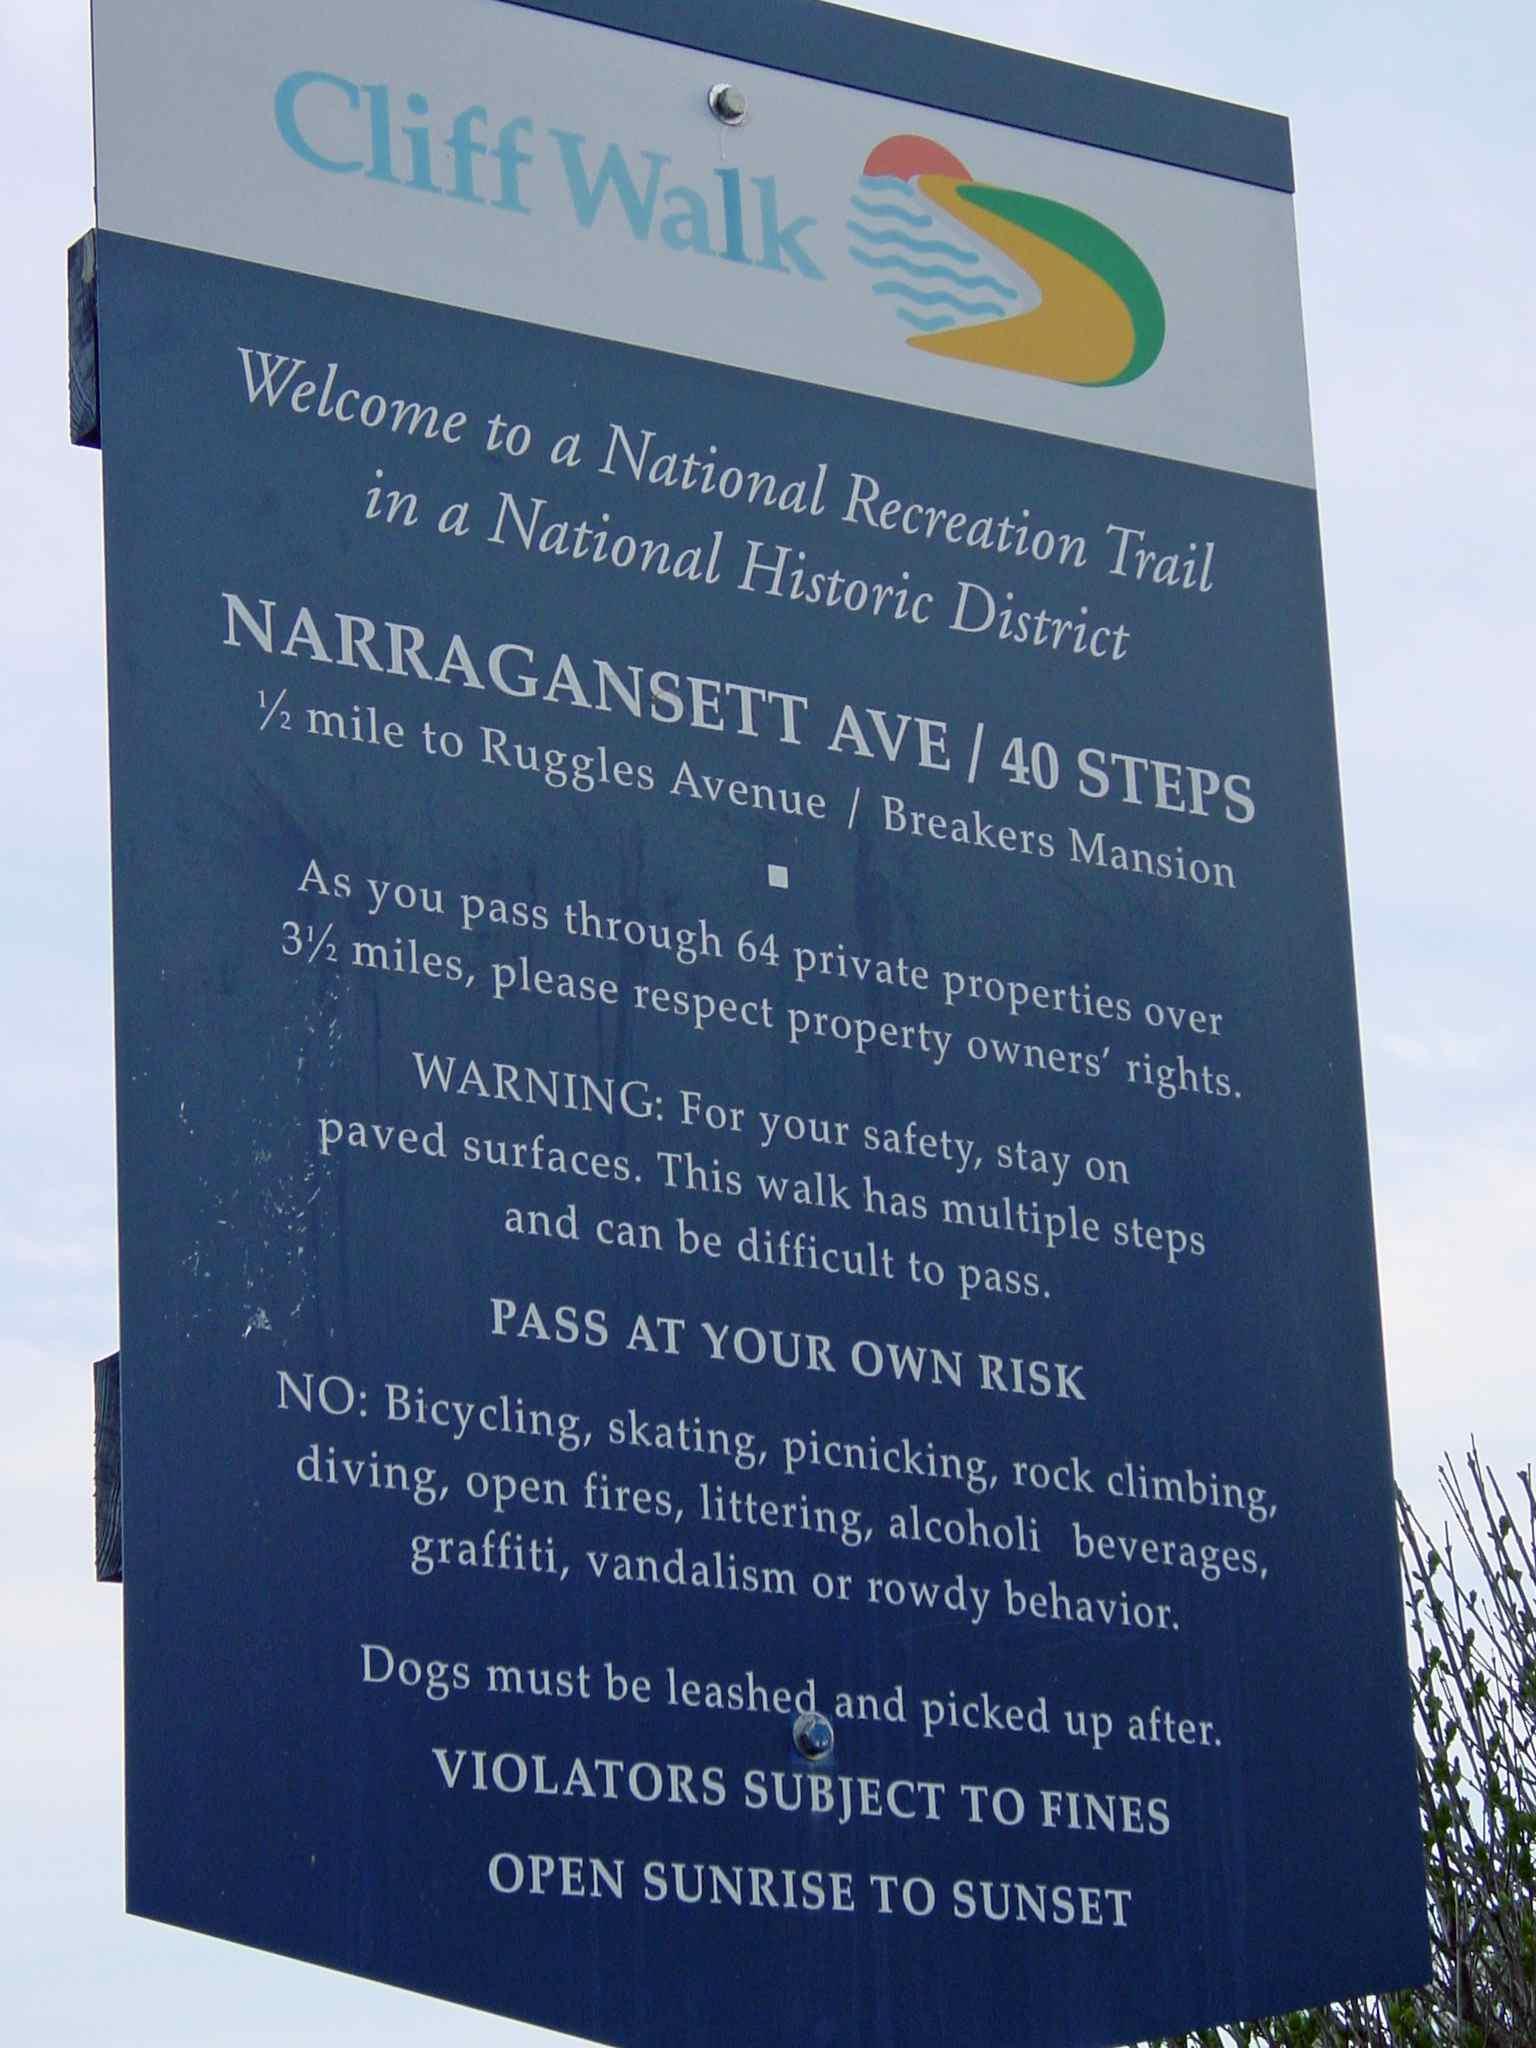 Cliff Walk Newport Rules for Visitors